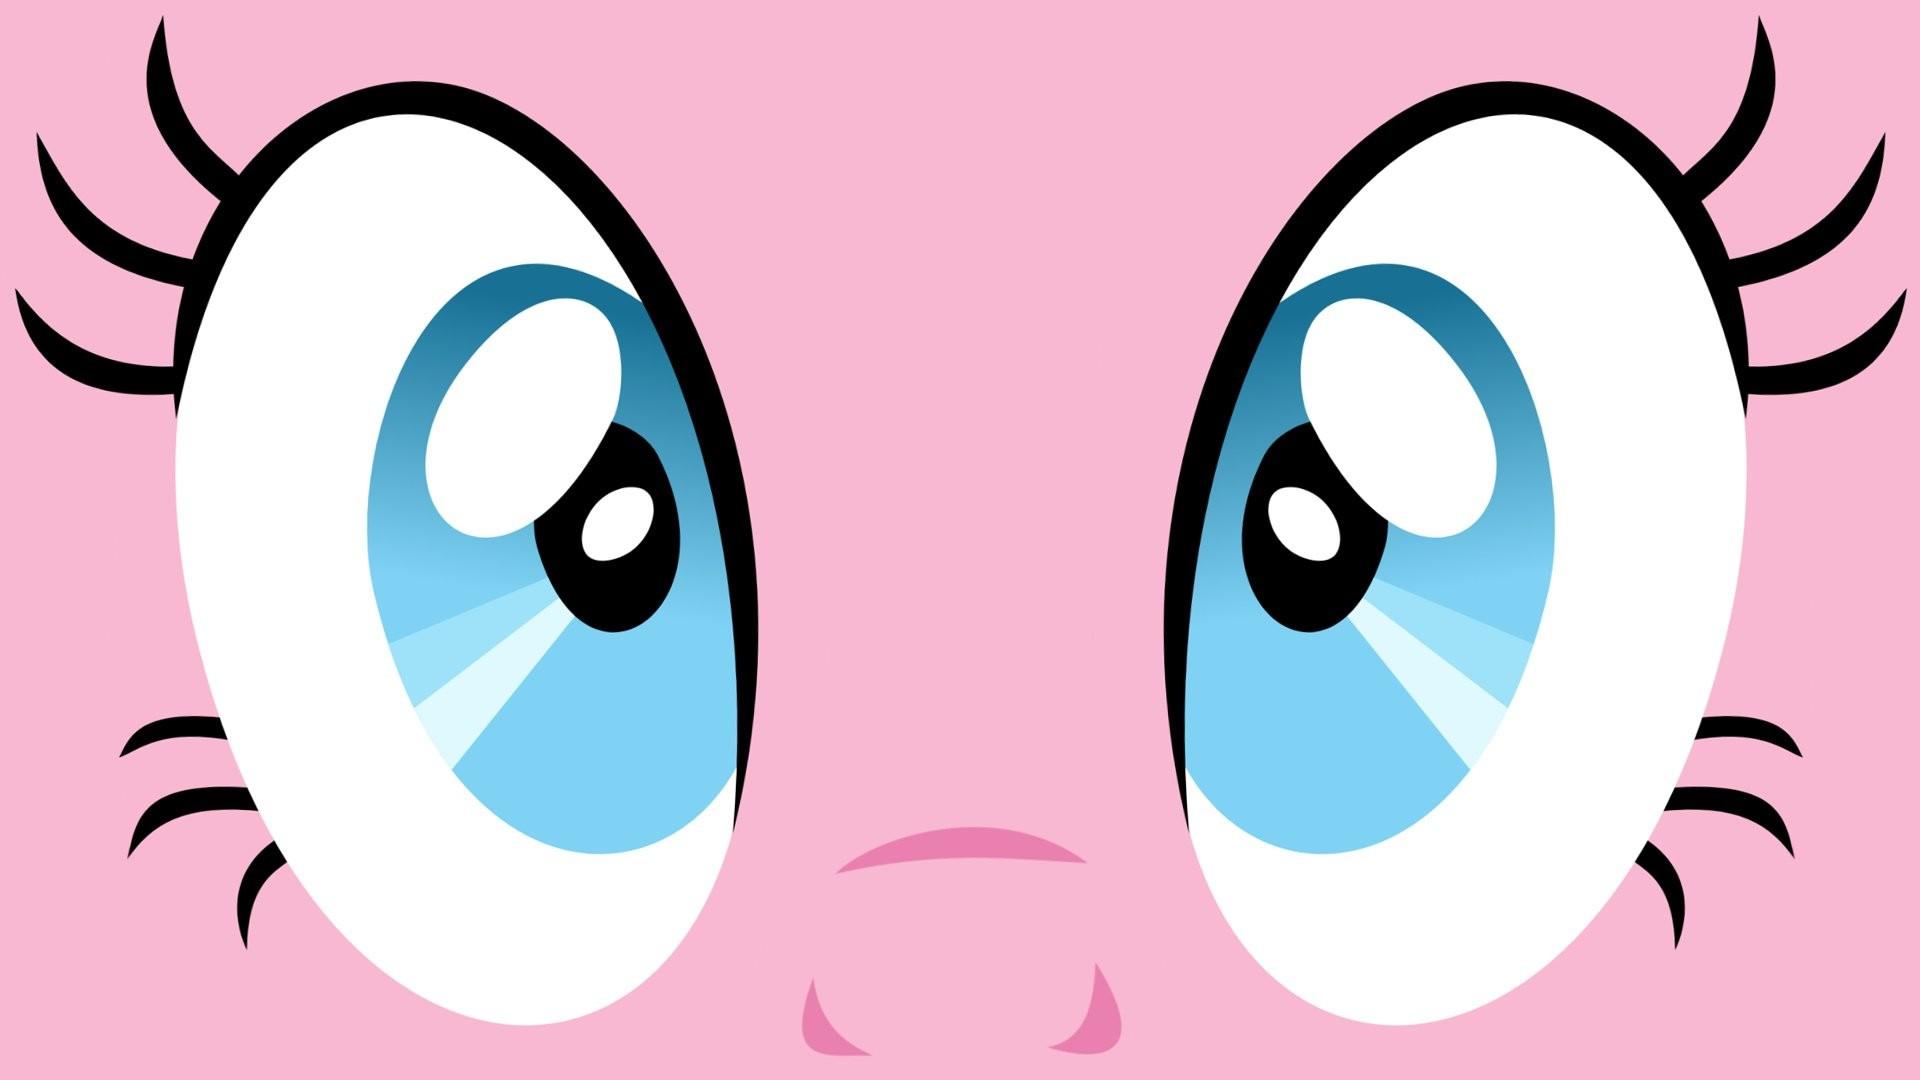 Surprised Face Emoji Wallpaper Full HD